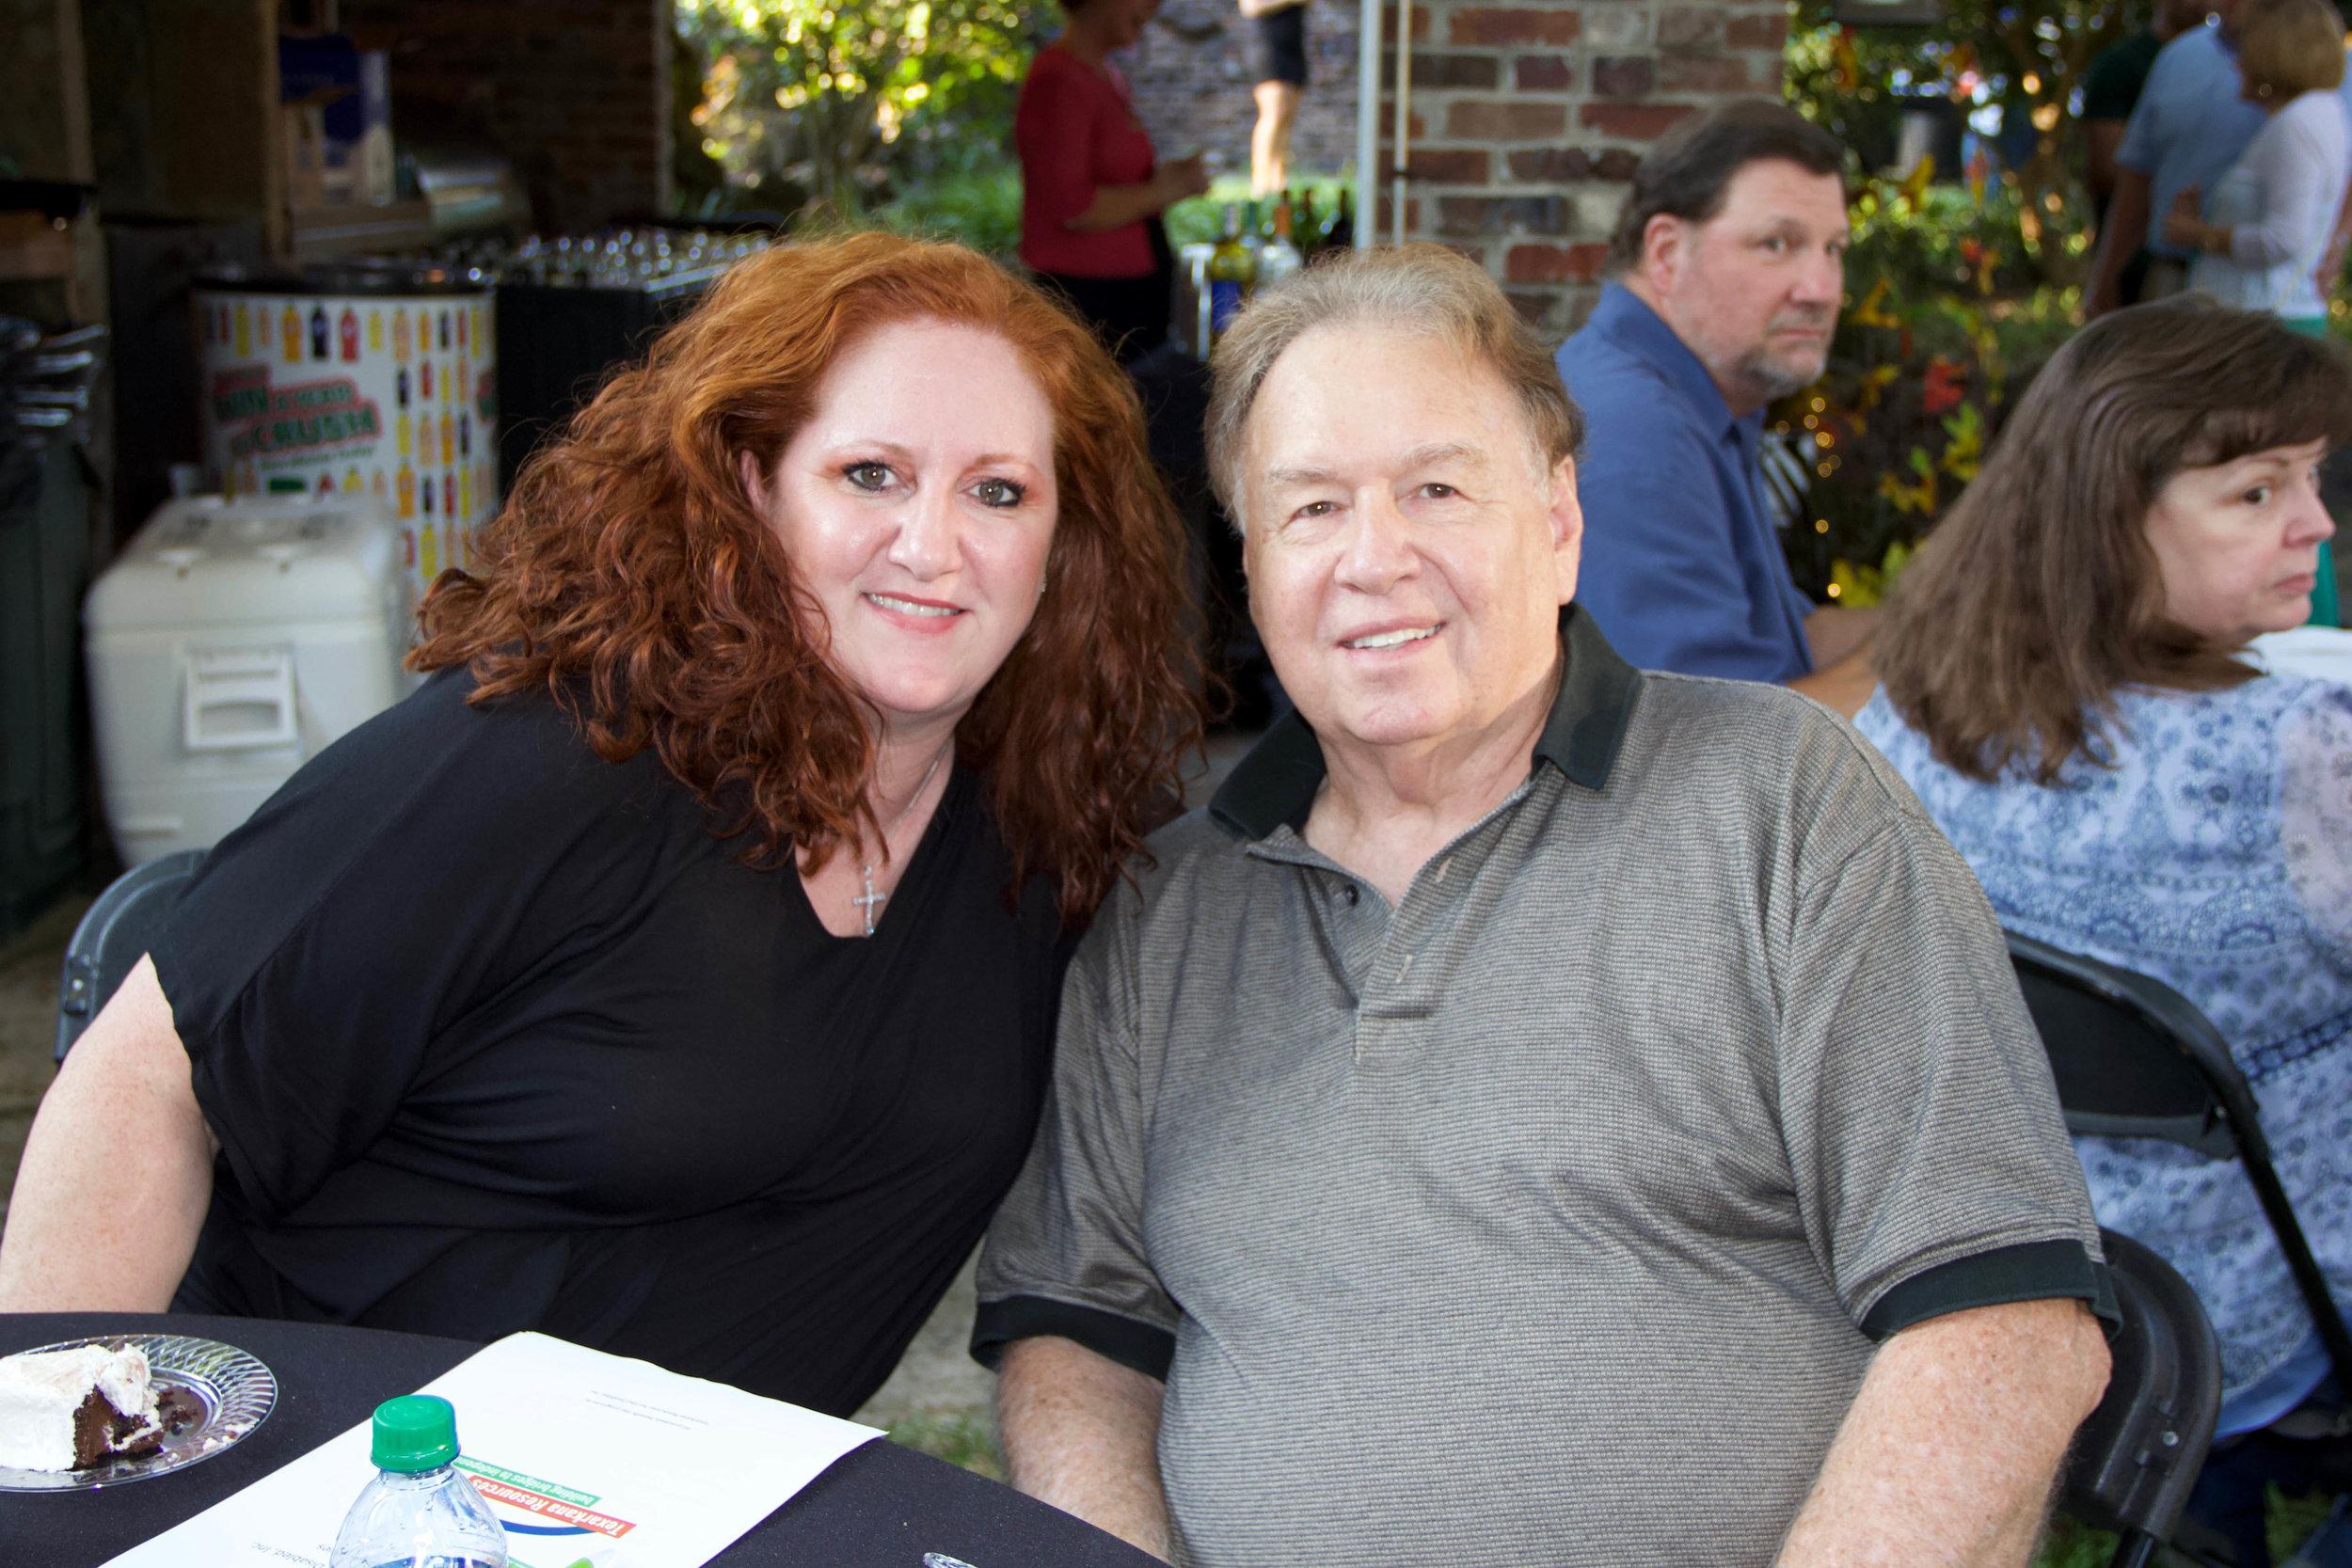 Laura Jenkins and Dr. Larry Davis